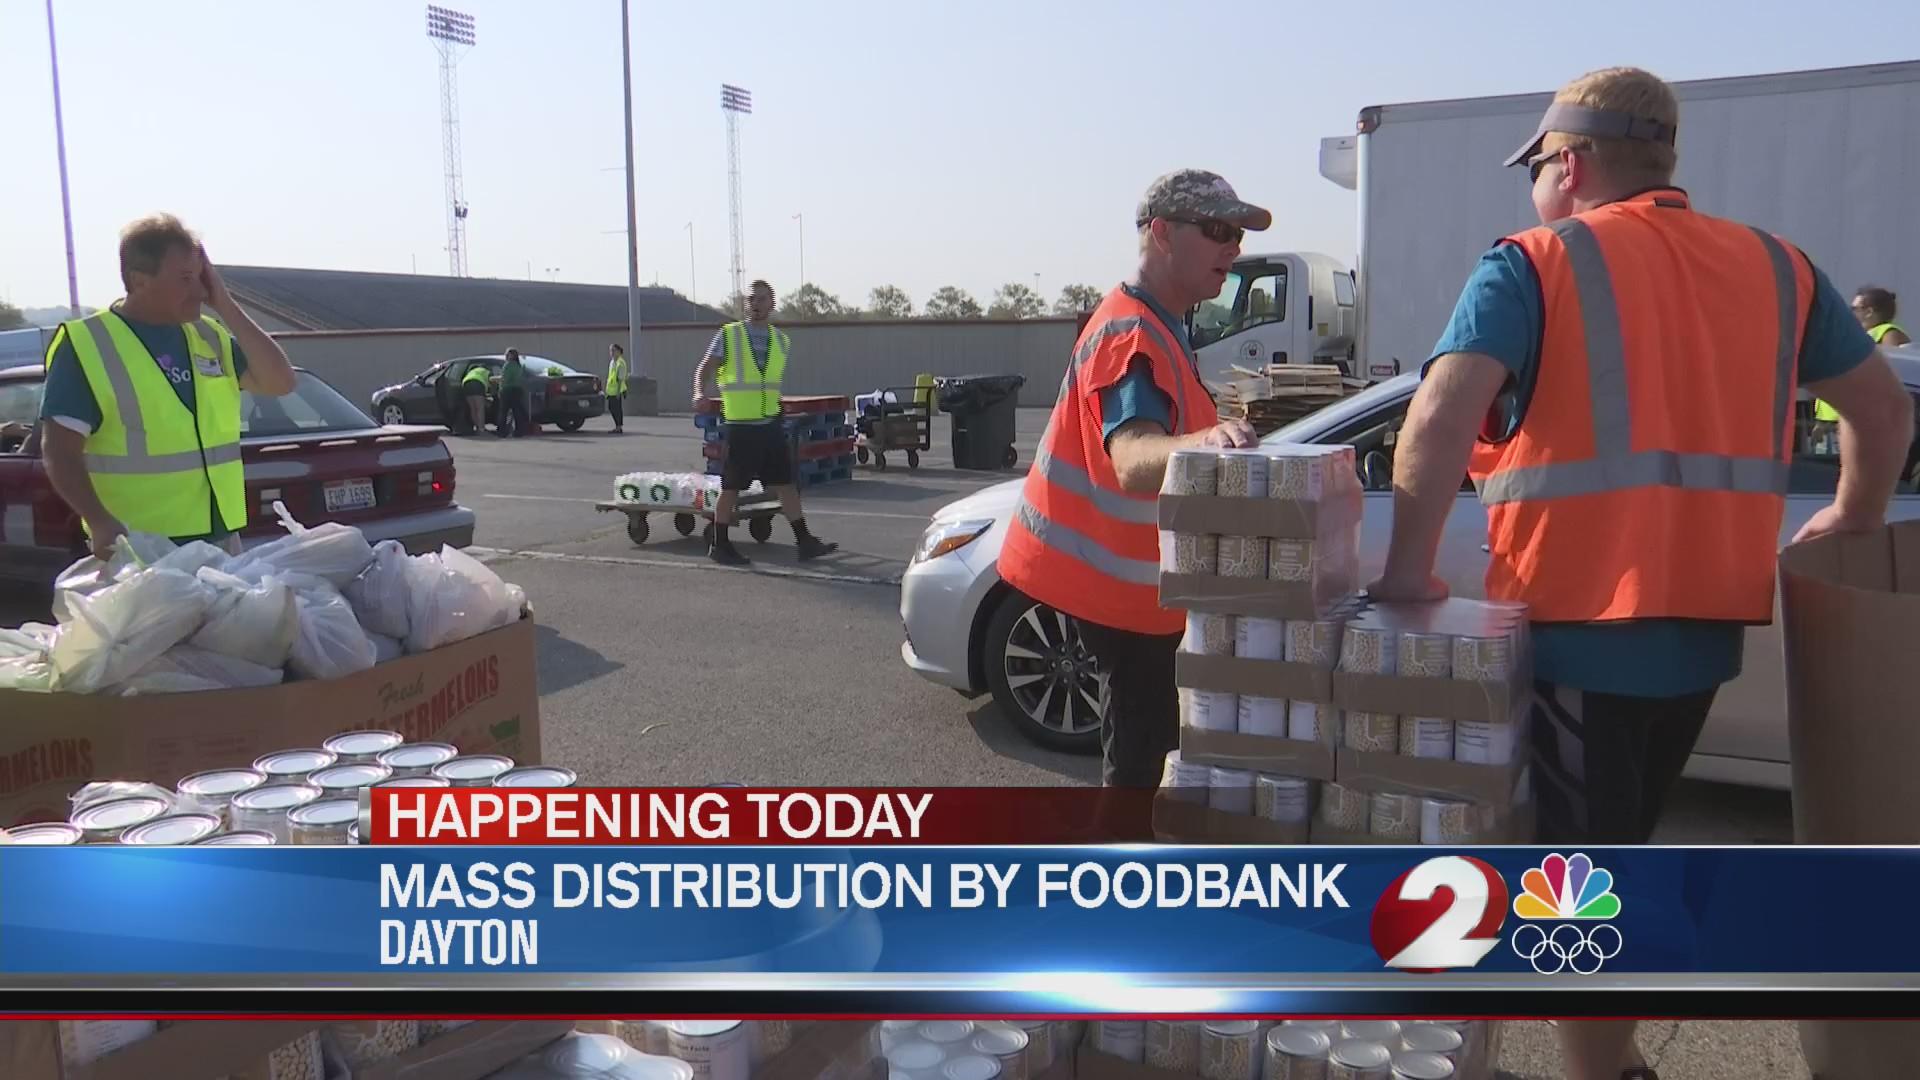 Mass distribution by Foodbank